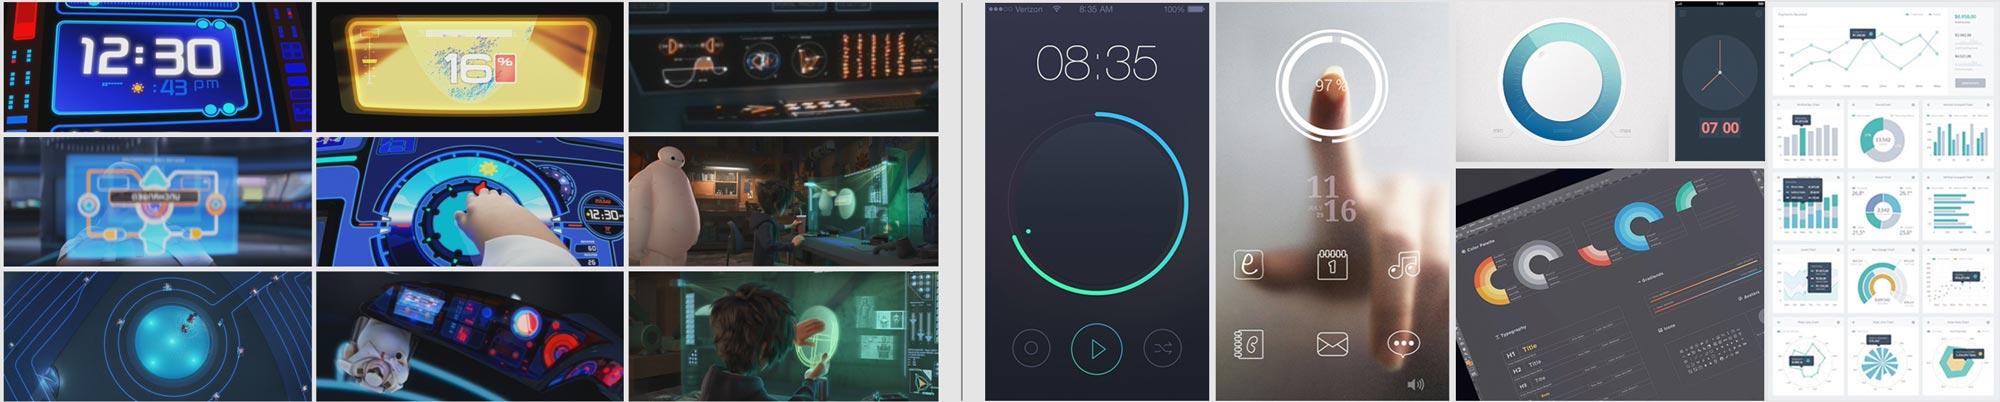 Pixar's Wall-e and Big Hero 6 (Left) Modern mobile UI designs (Right)